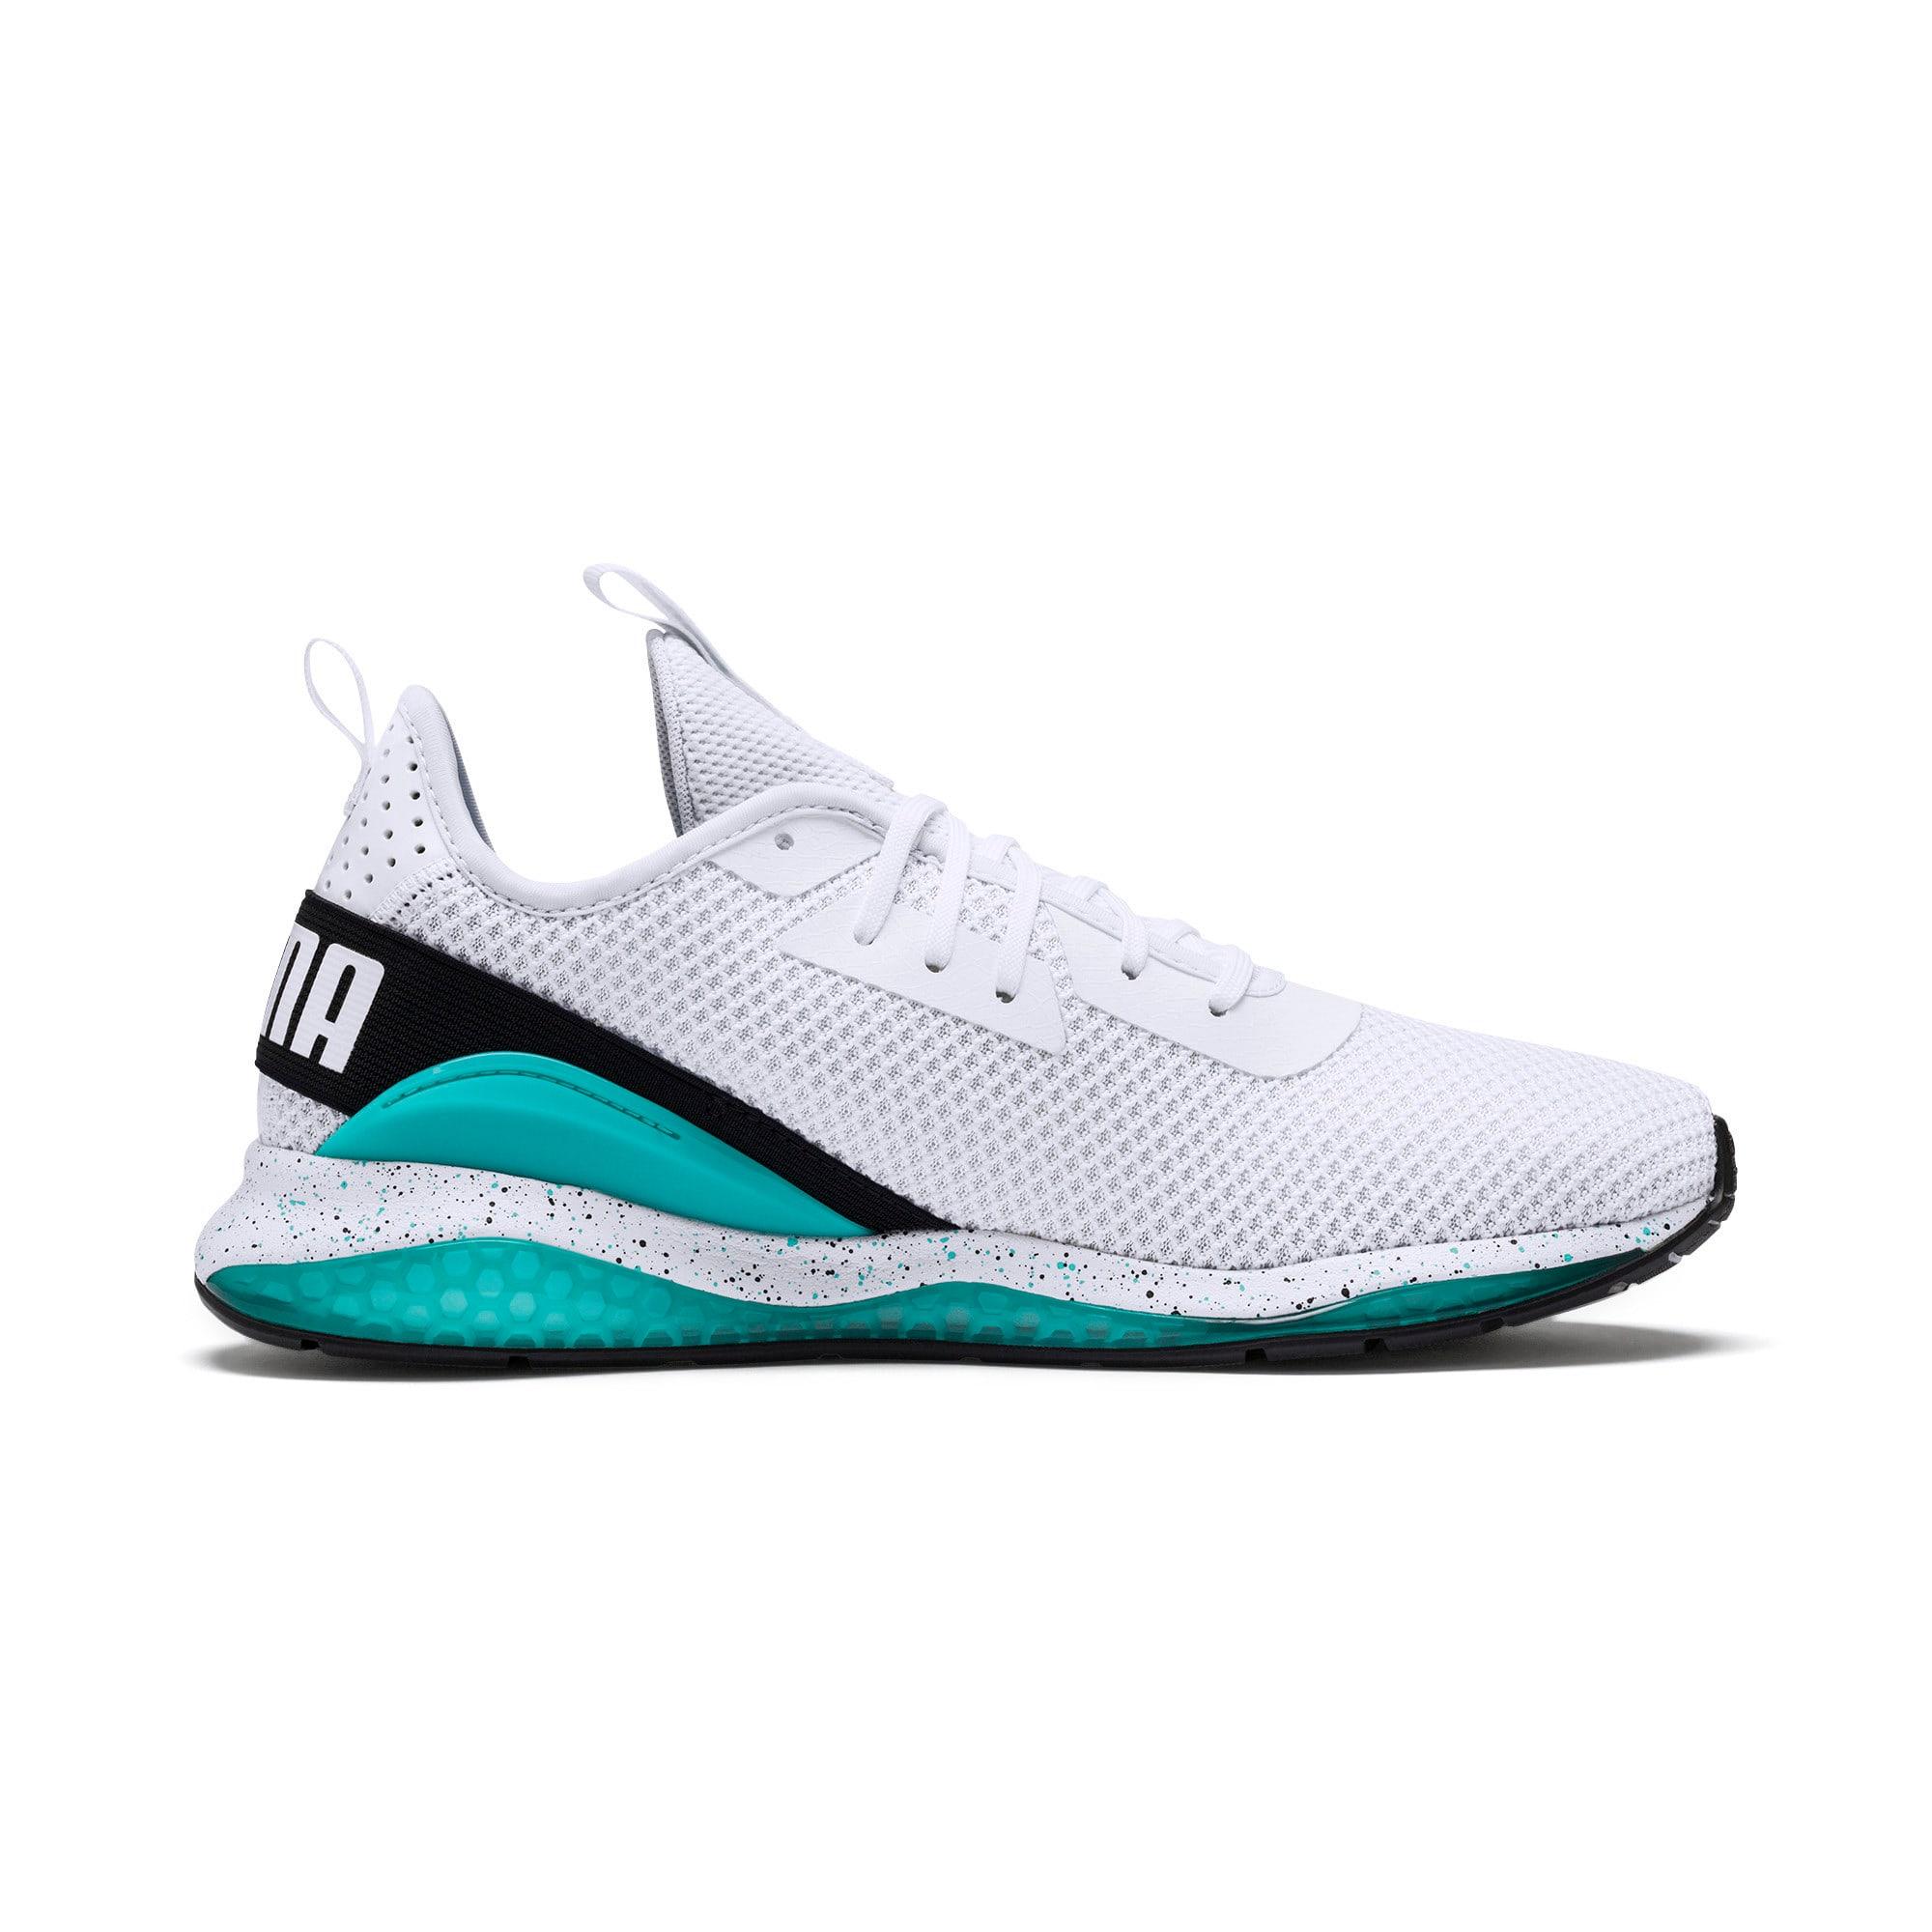 Miniatura 7 de Zapatos de entrenamiento CELL Descend Weave para hombre, White-Black-Blue Turquoise, mediano